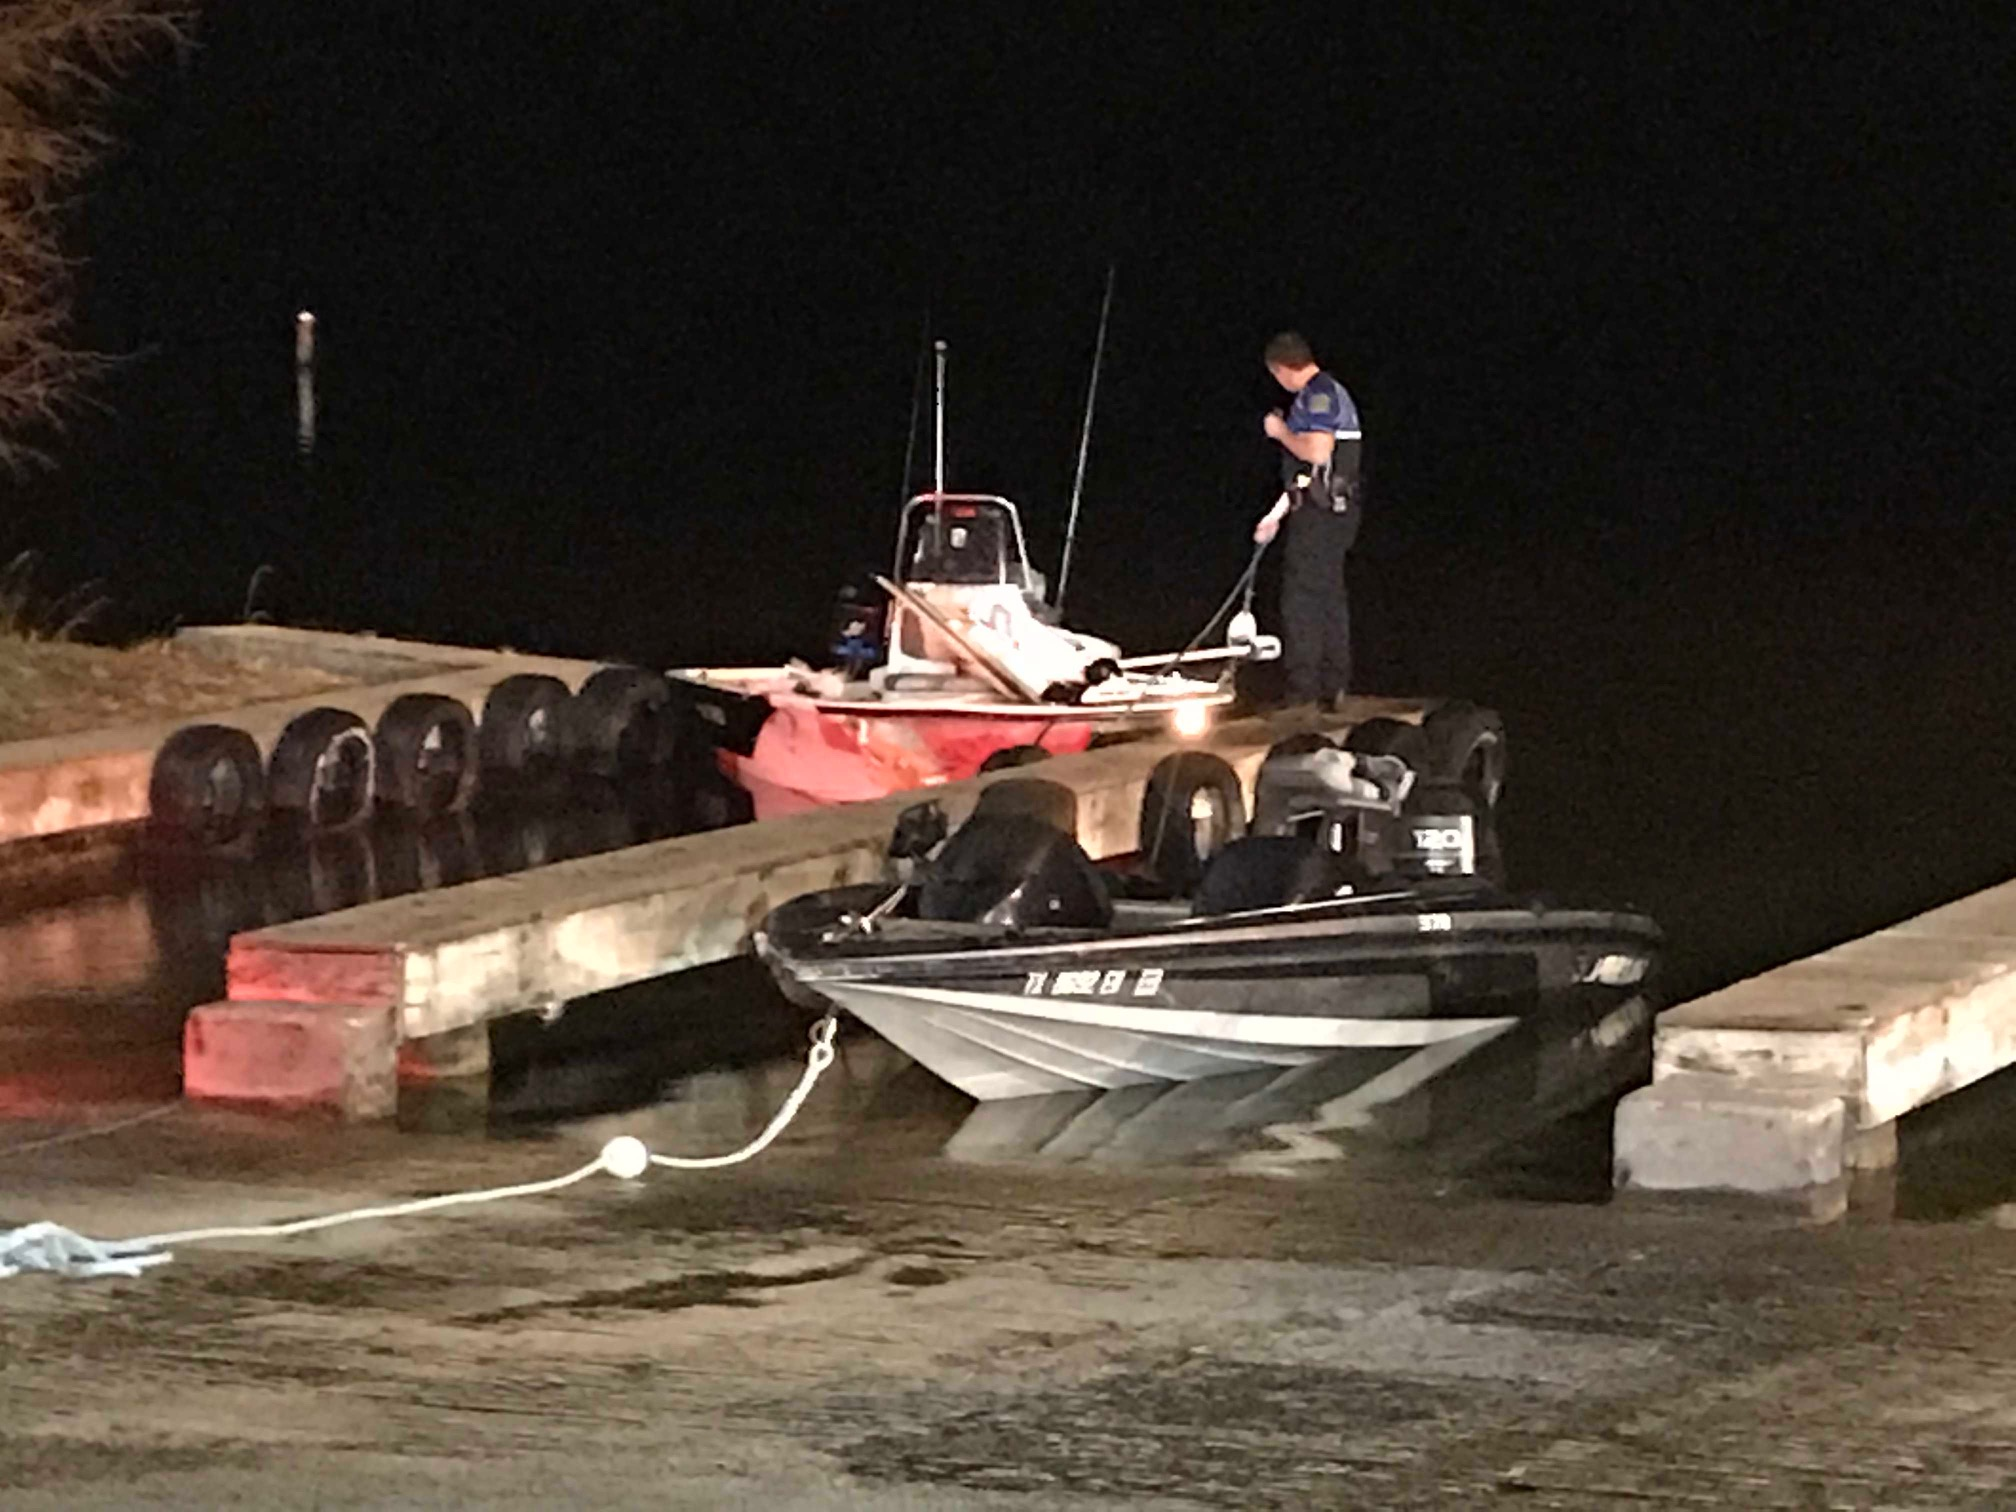 Austin officials survey two boats that crashed on Lake Austin near the Loop 360 bridge on Jan. 23, 2018 (KXAN Photo/Tim Holcomb)